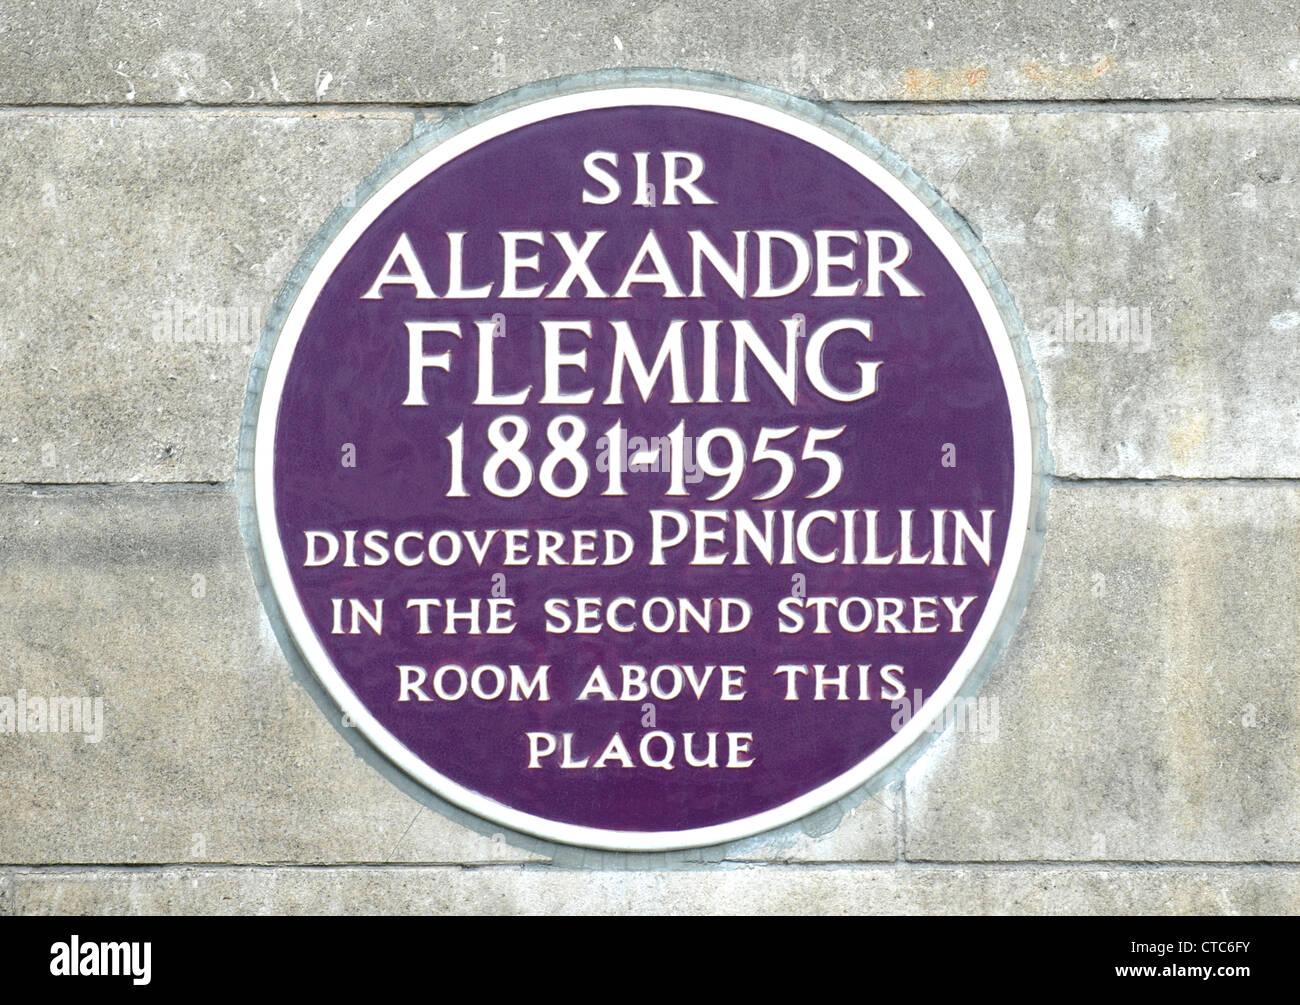 Memorial Plaque to Sir Alexander Fleming, Paddington, London, Britain, UK - Stock Image